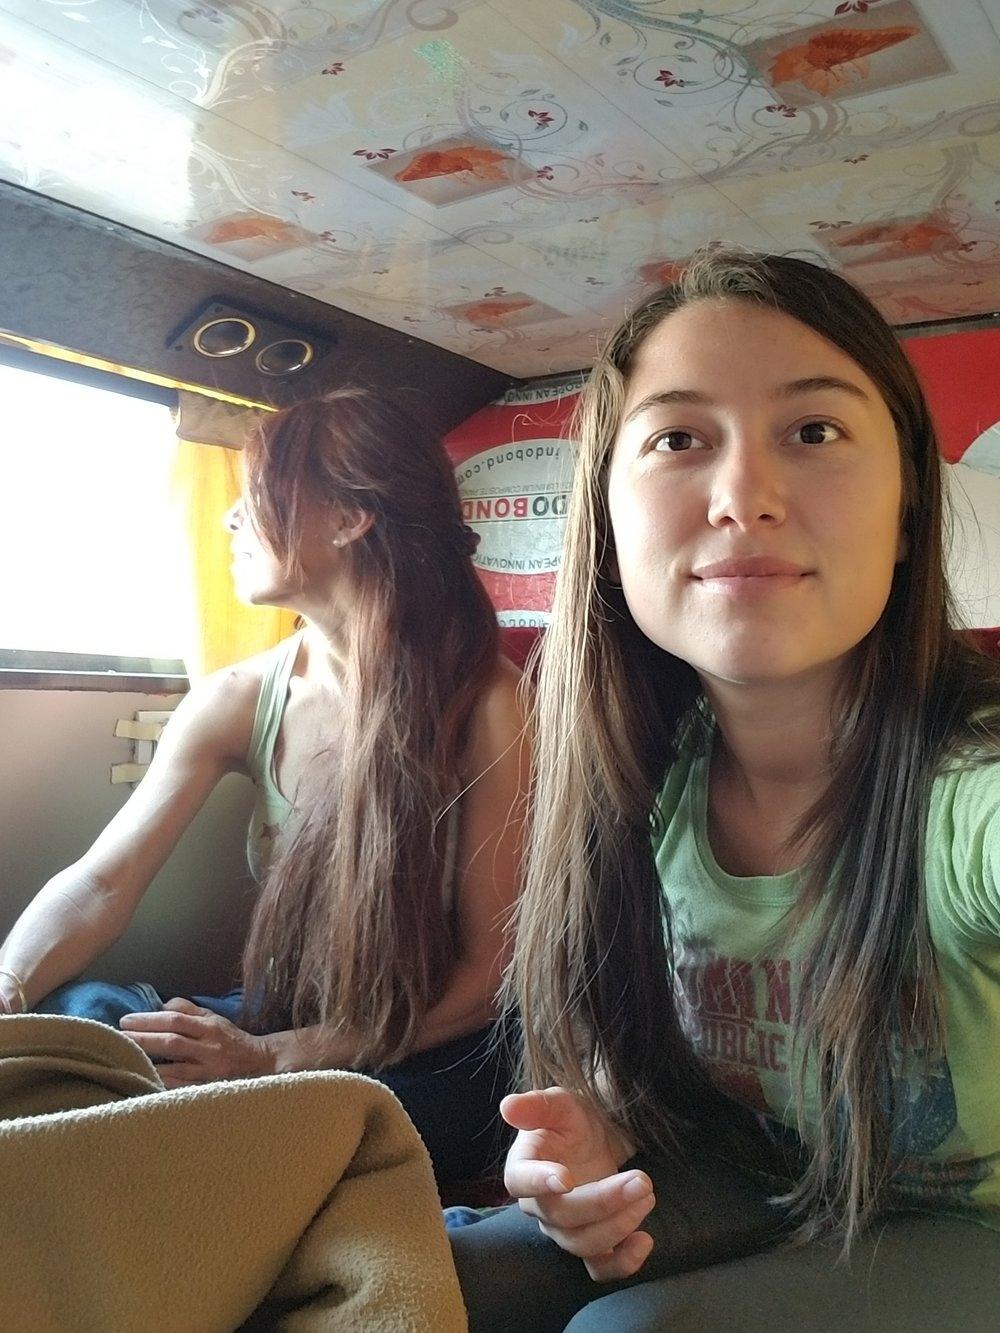 Le fancy bus ride